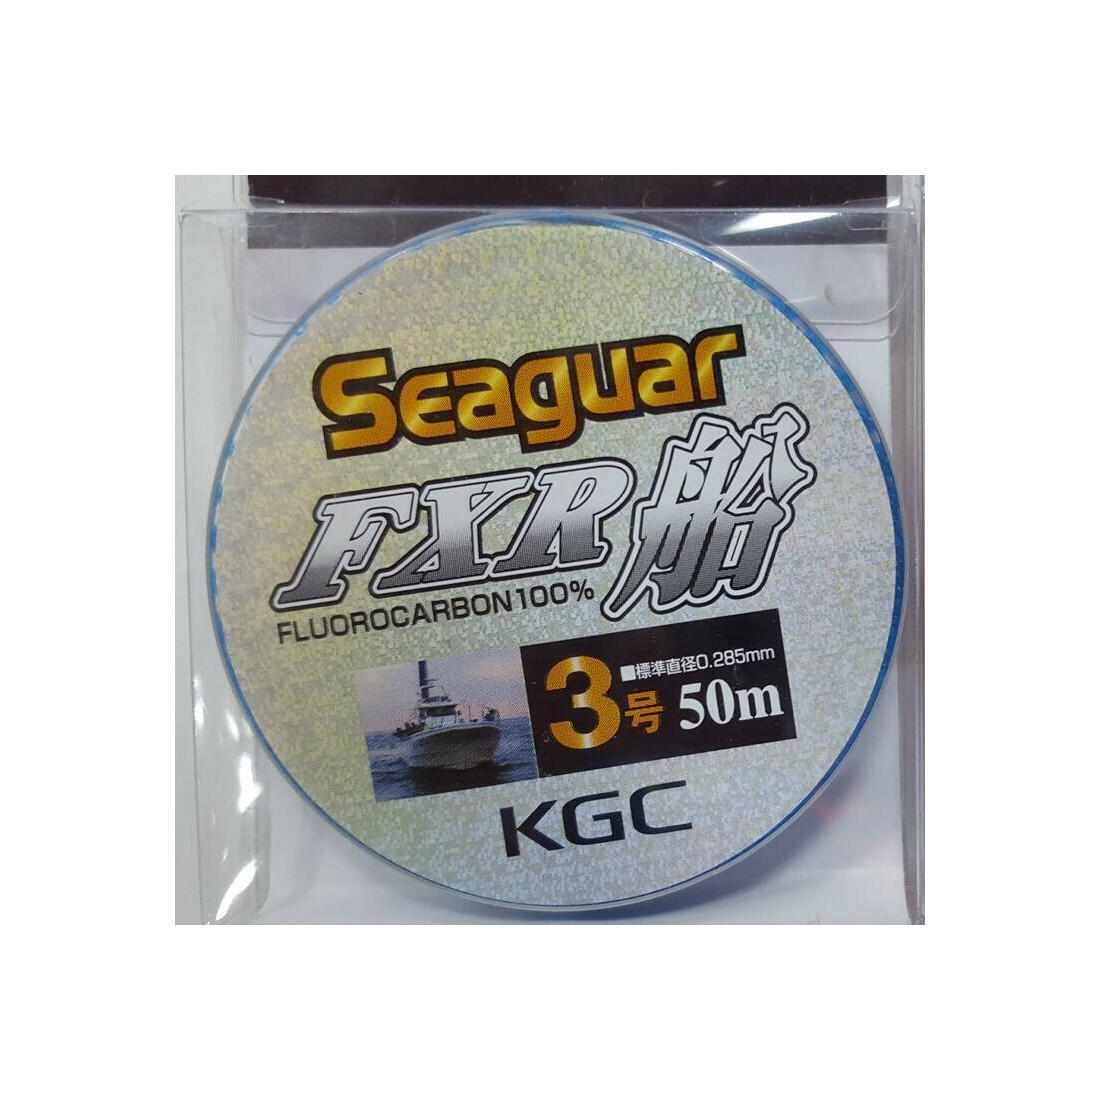 60 lbs 100m//110yd SEAGUAR FXR BOAT 100/% FLUOROCARBON Leader # 16 Japan #16 U.S